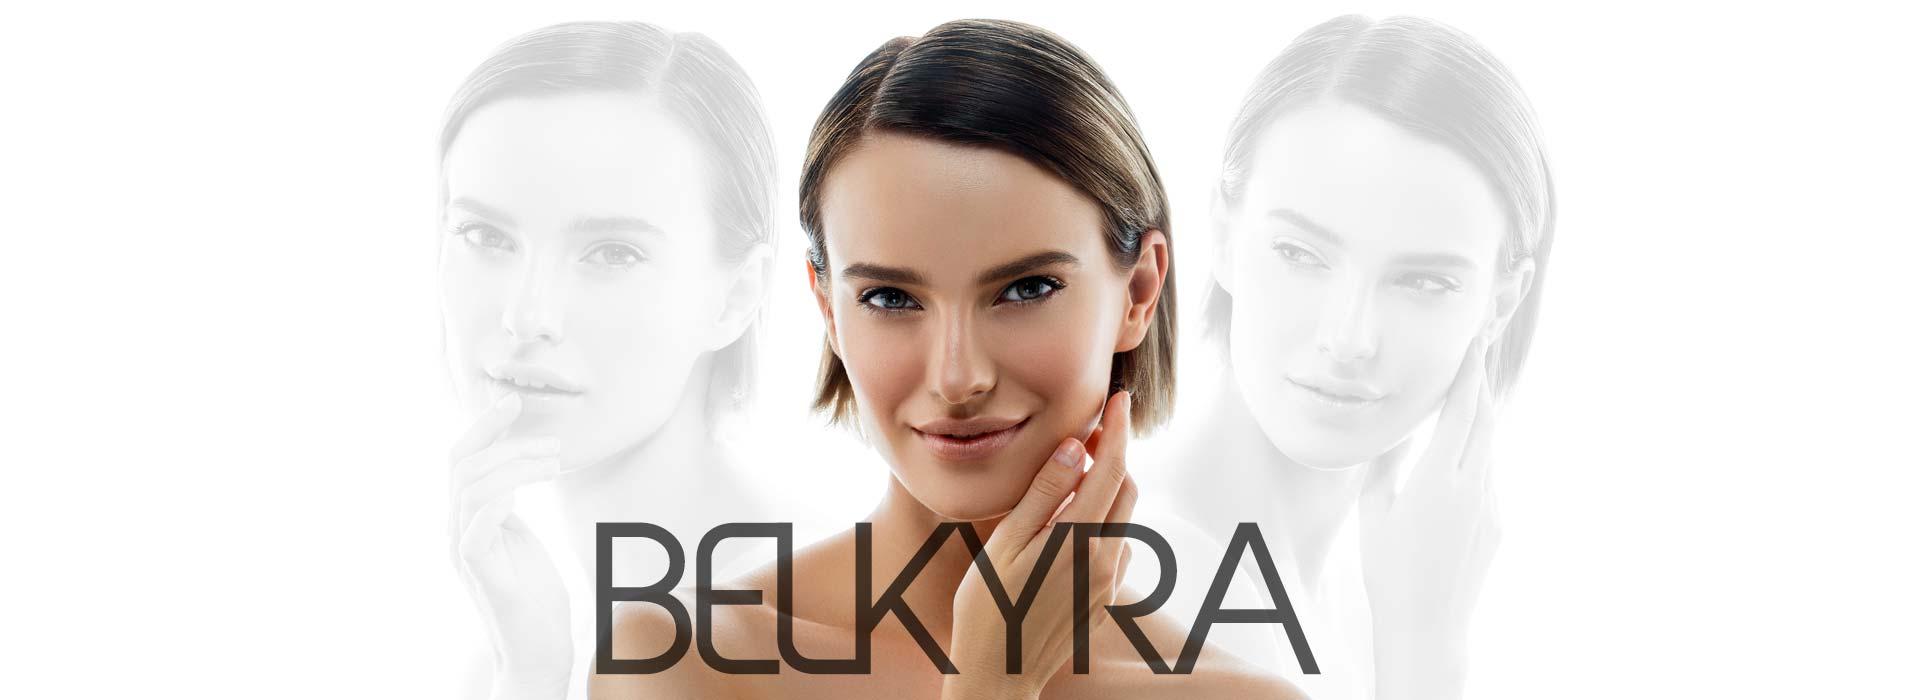 clinique-peause-soins-medico-esthetique-belkyra